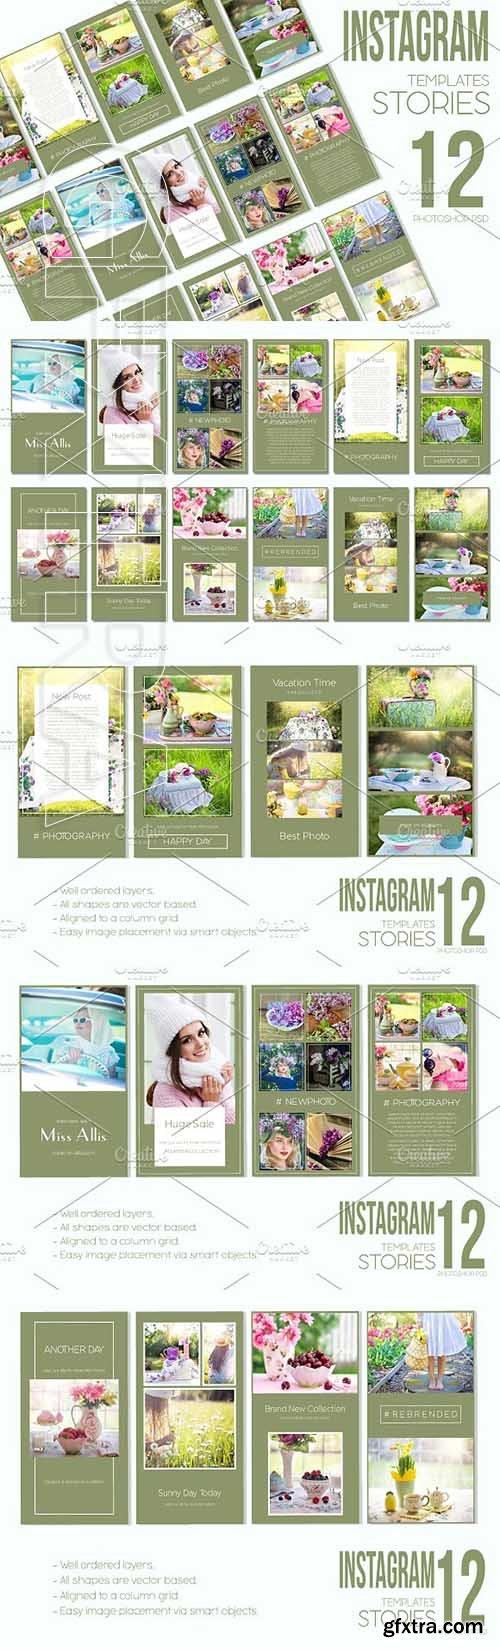 CreativeMarket - Instagram Stories Pack Green Day